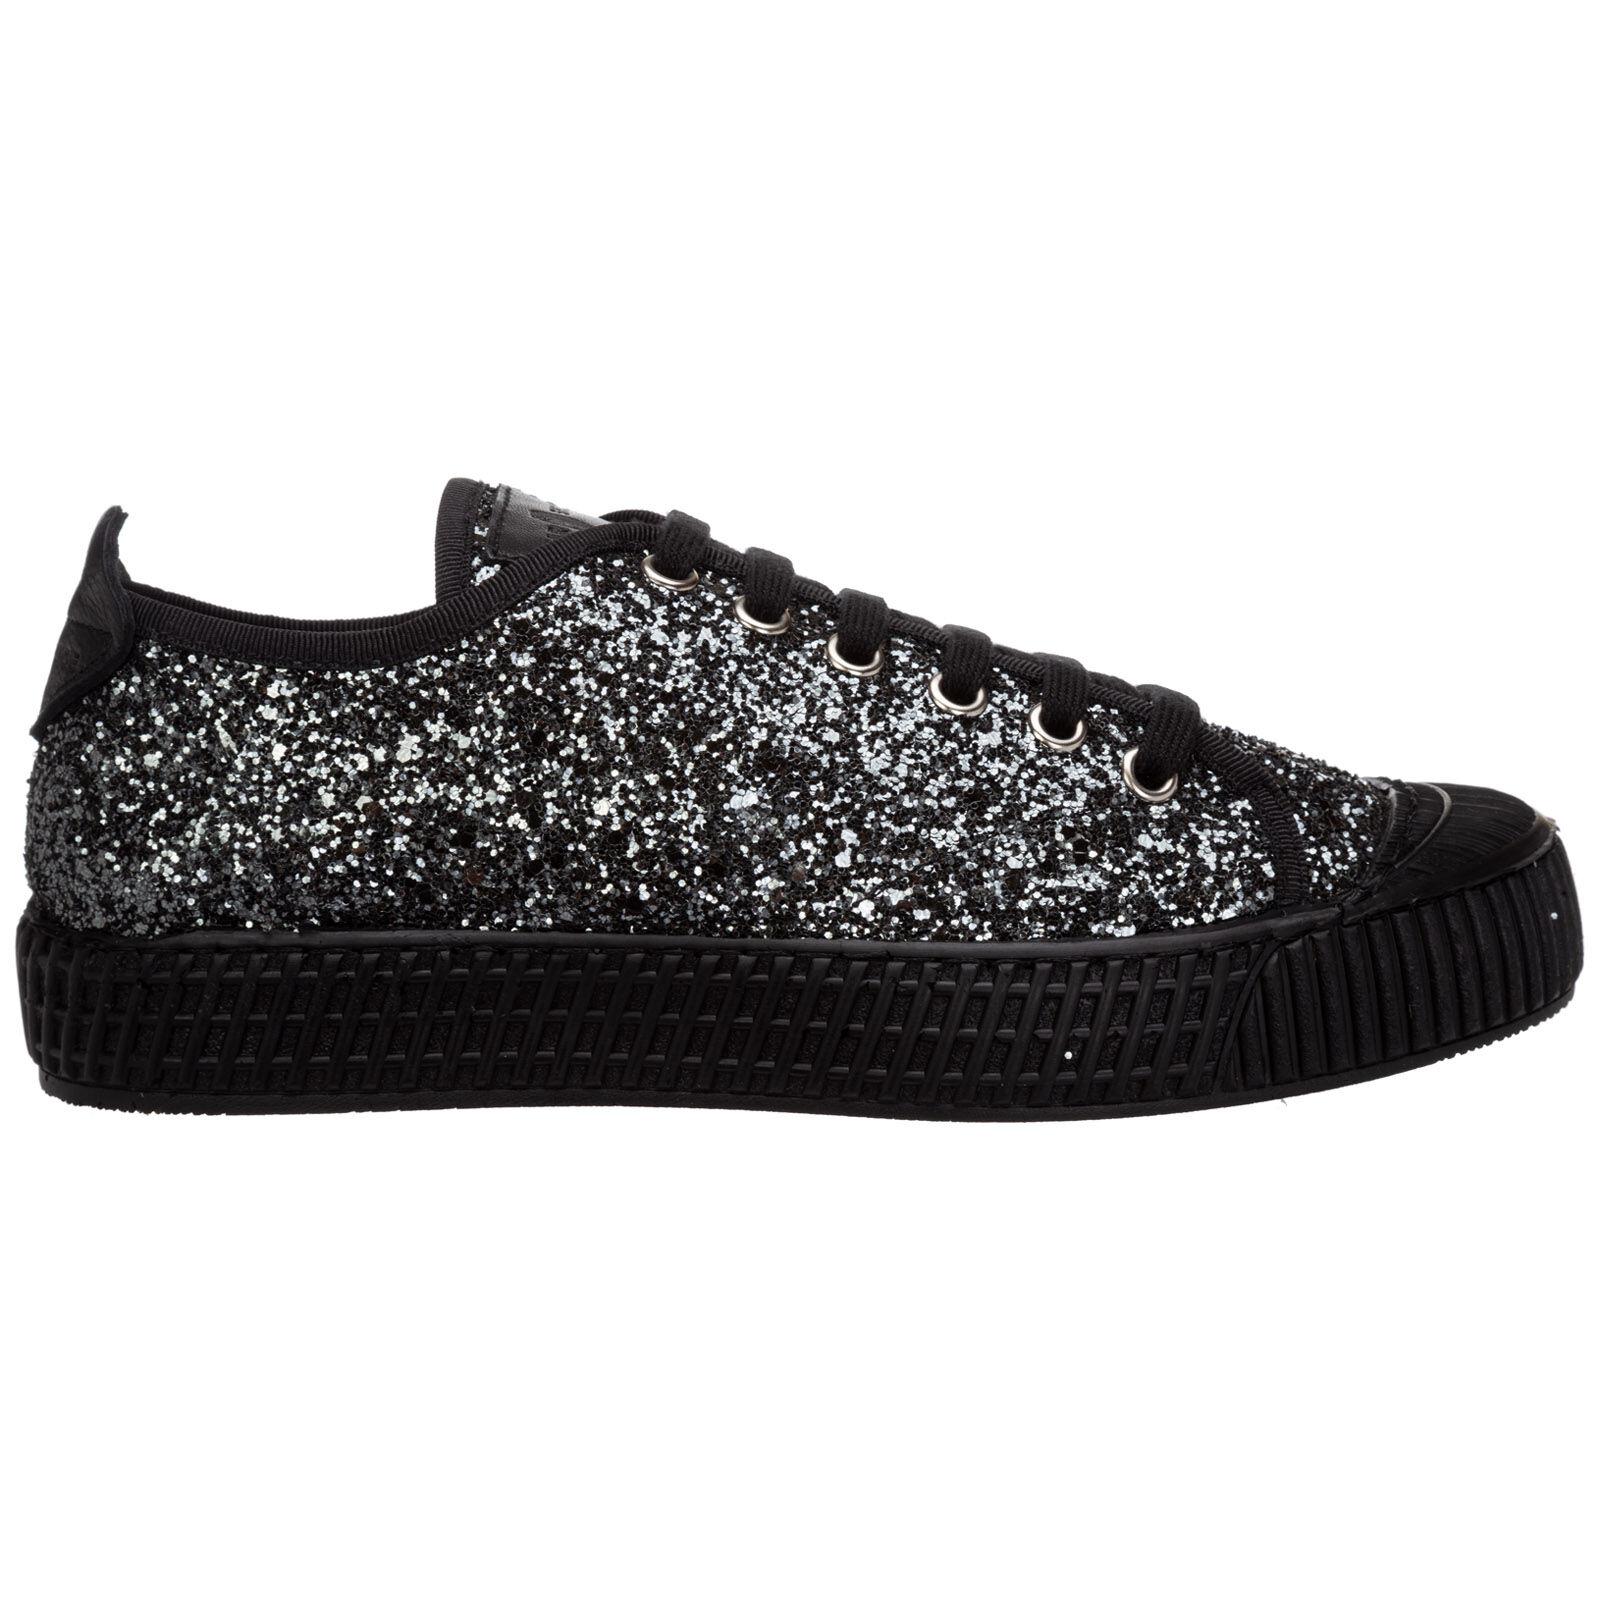 Car Shoe Women's shoes trainers sneakers  - Black - Size: 38